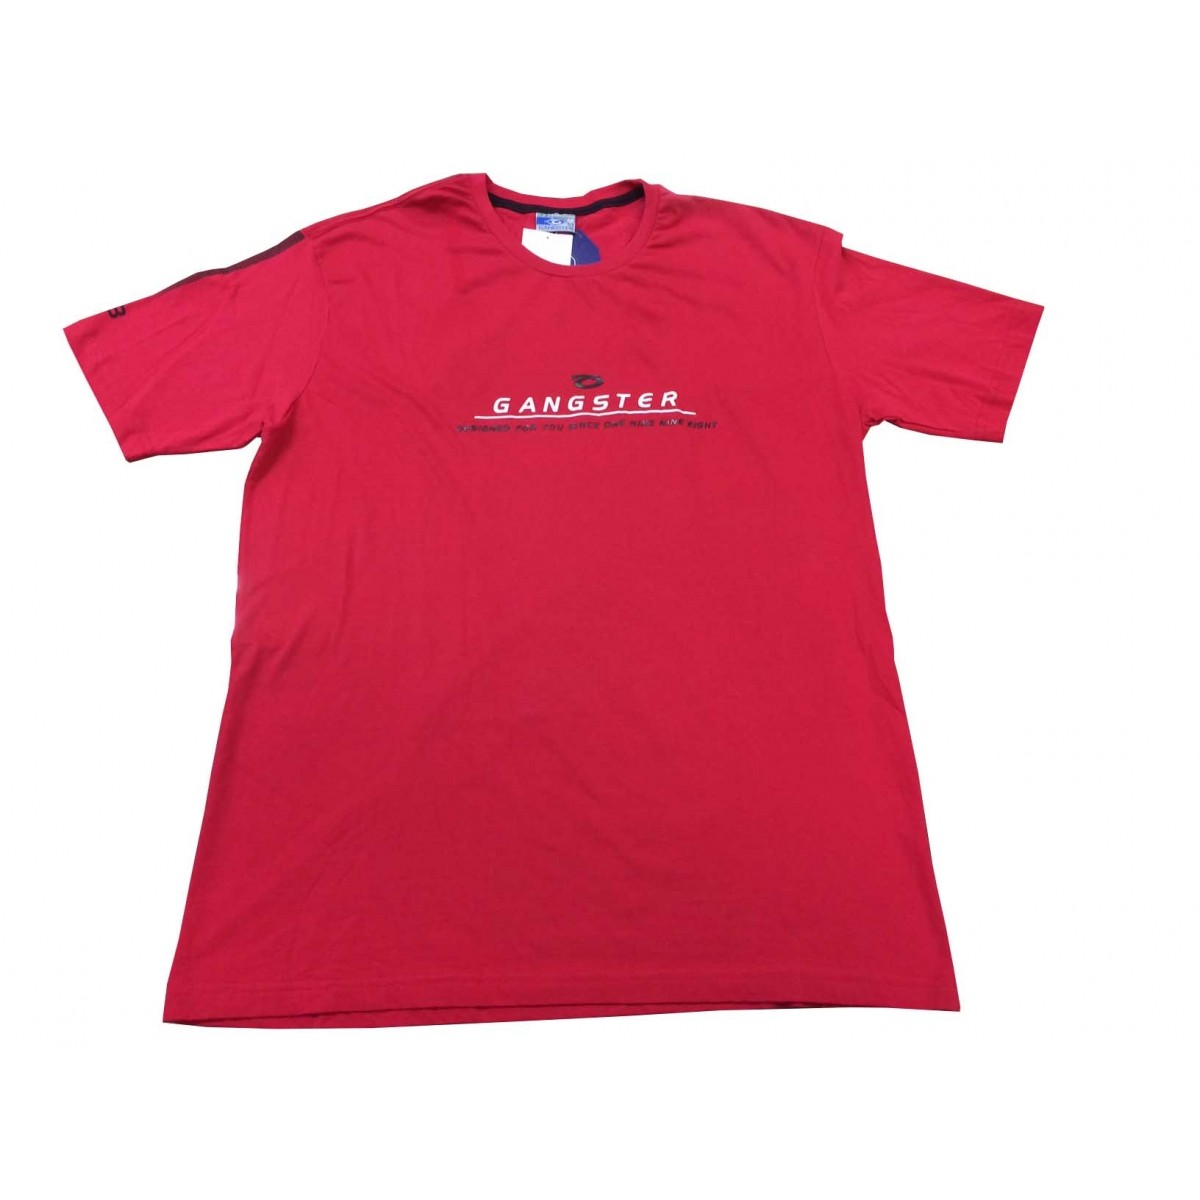 Camiseta Masculina Gangster Tamanhos Grandes G1 - G3 50018